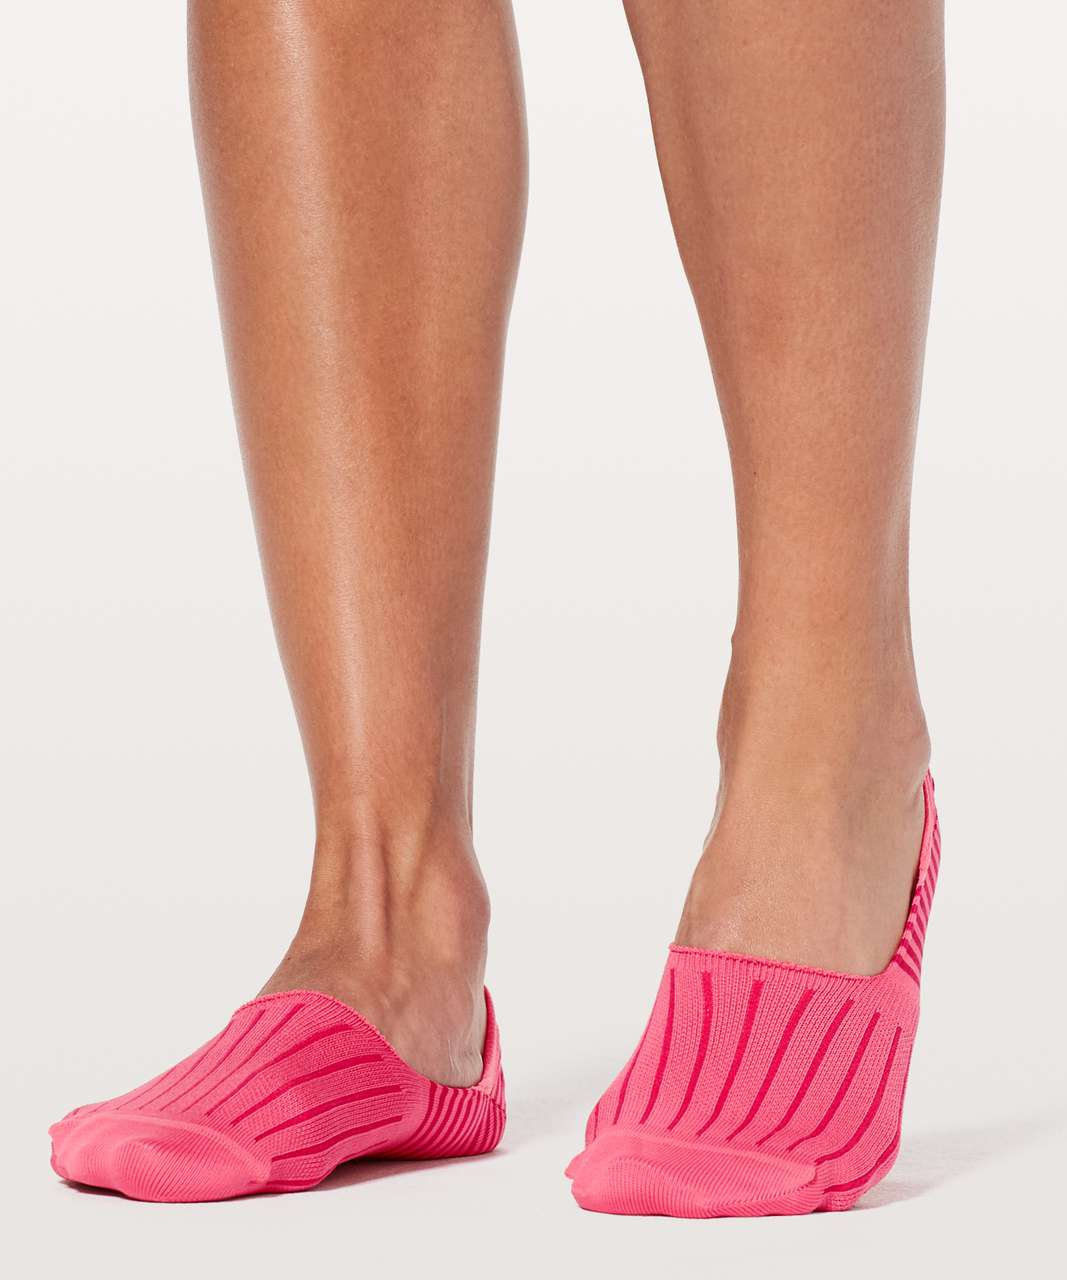 Lululemon Secret Sock - Glossy / Fuchsia Pink